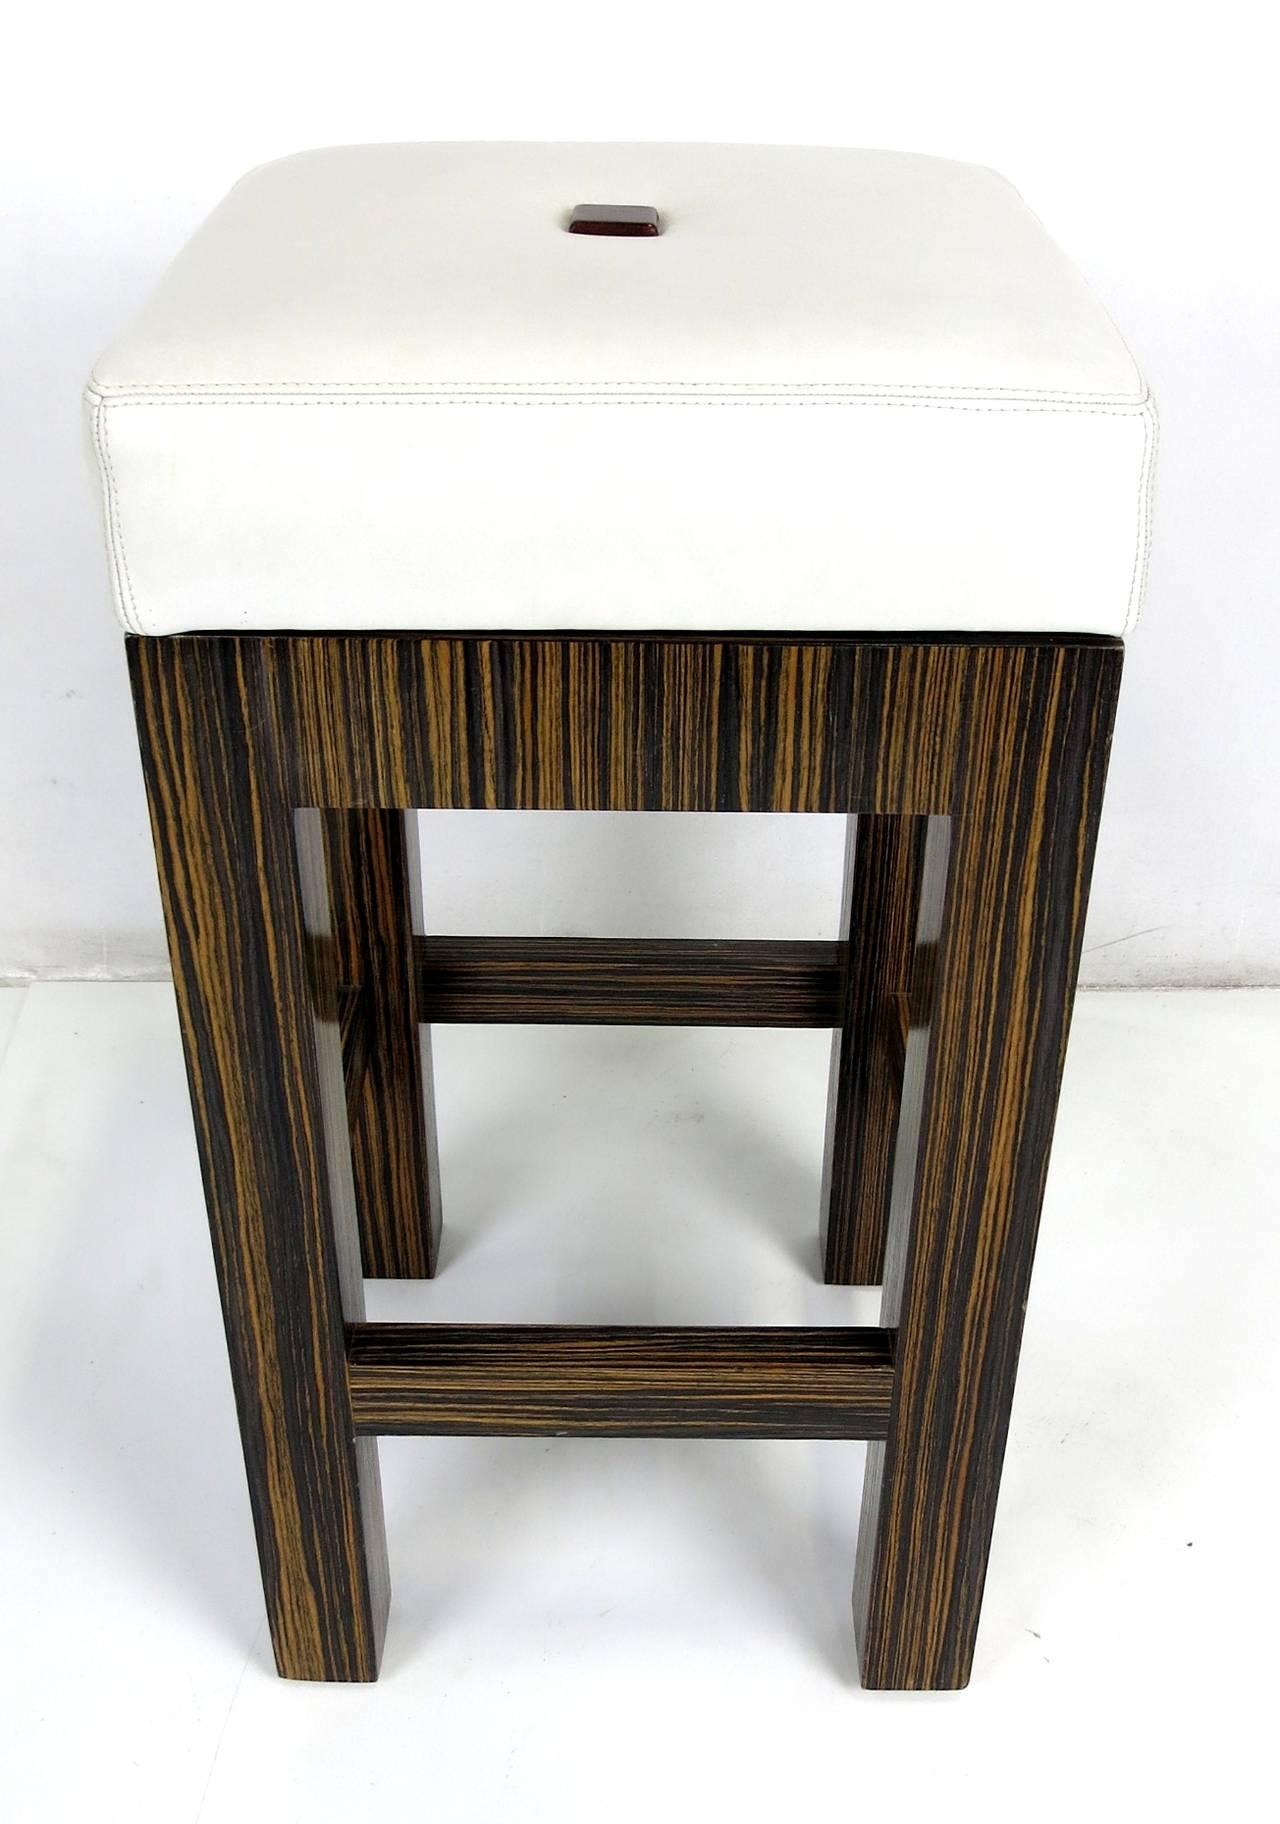 Set of Three Macassar Ebony Swiveling Bar Stools with Leather Seats